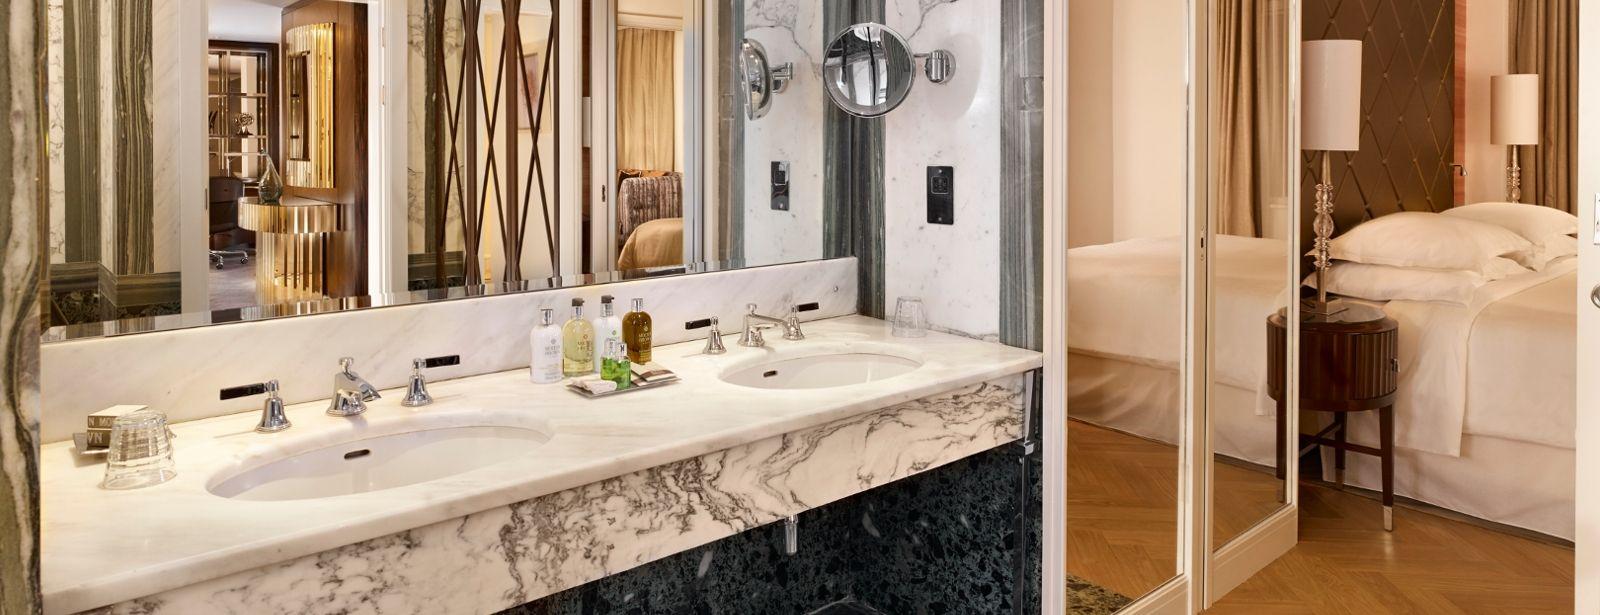 presidential-suite-bathroom-sheraton-grand-park-lane-hotel-london-piccadilly-mayfair